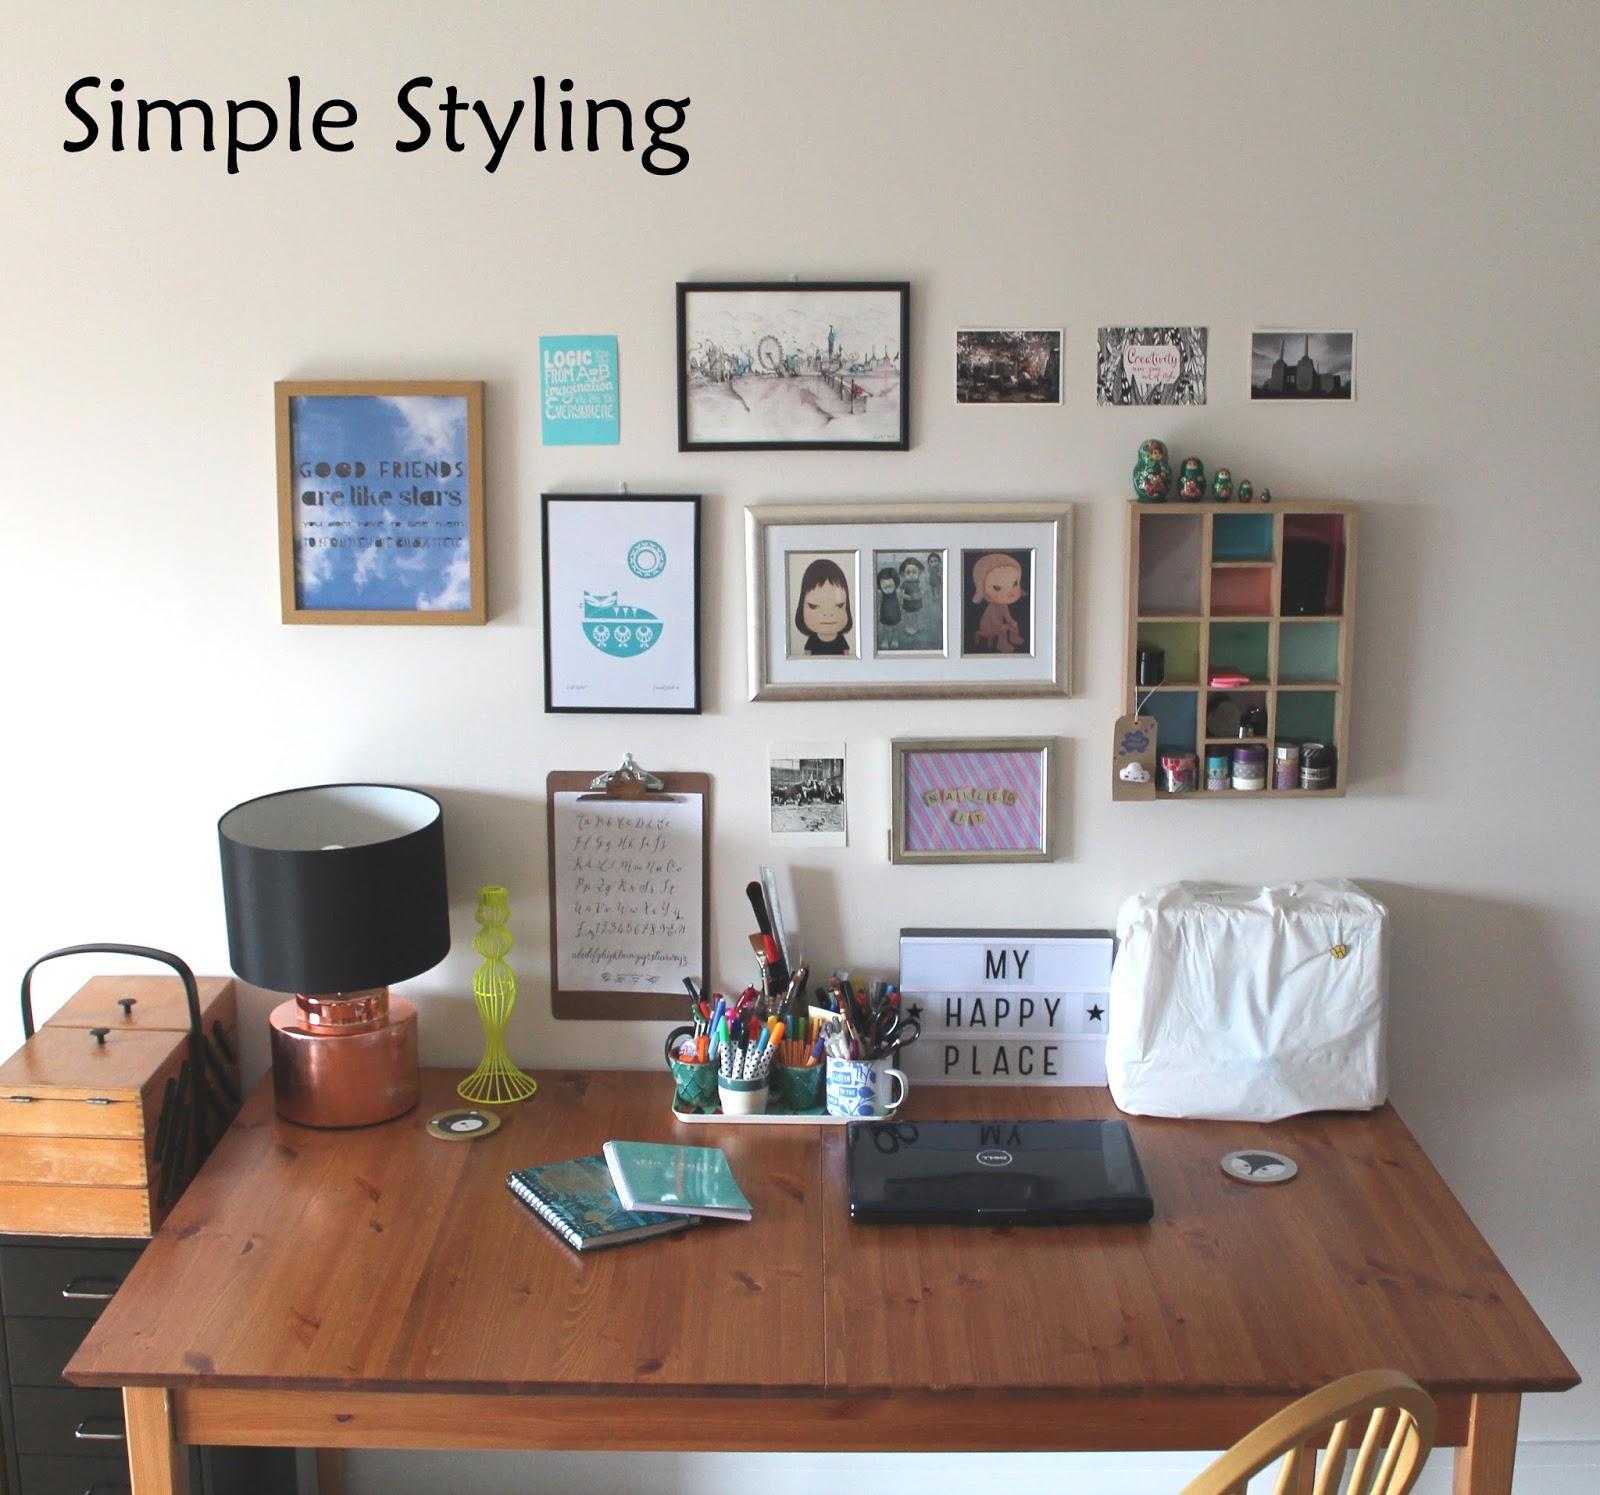 Live It Love It Make It Simple Styling Workspace